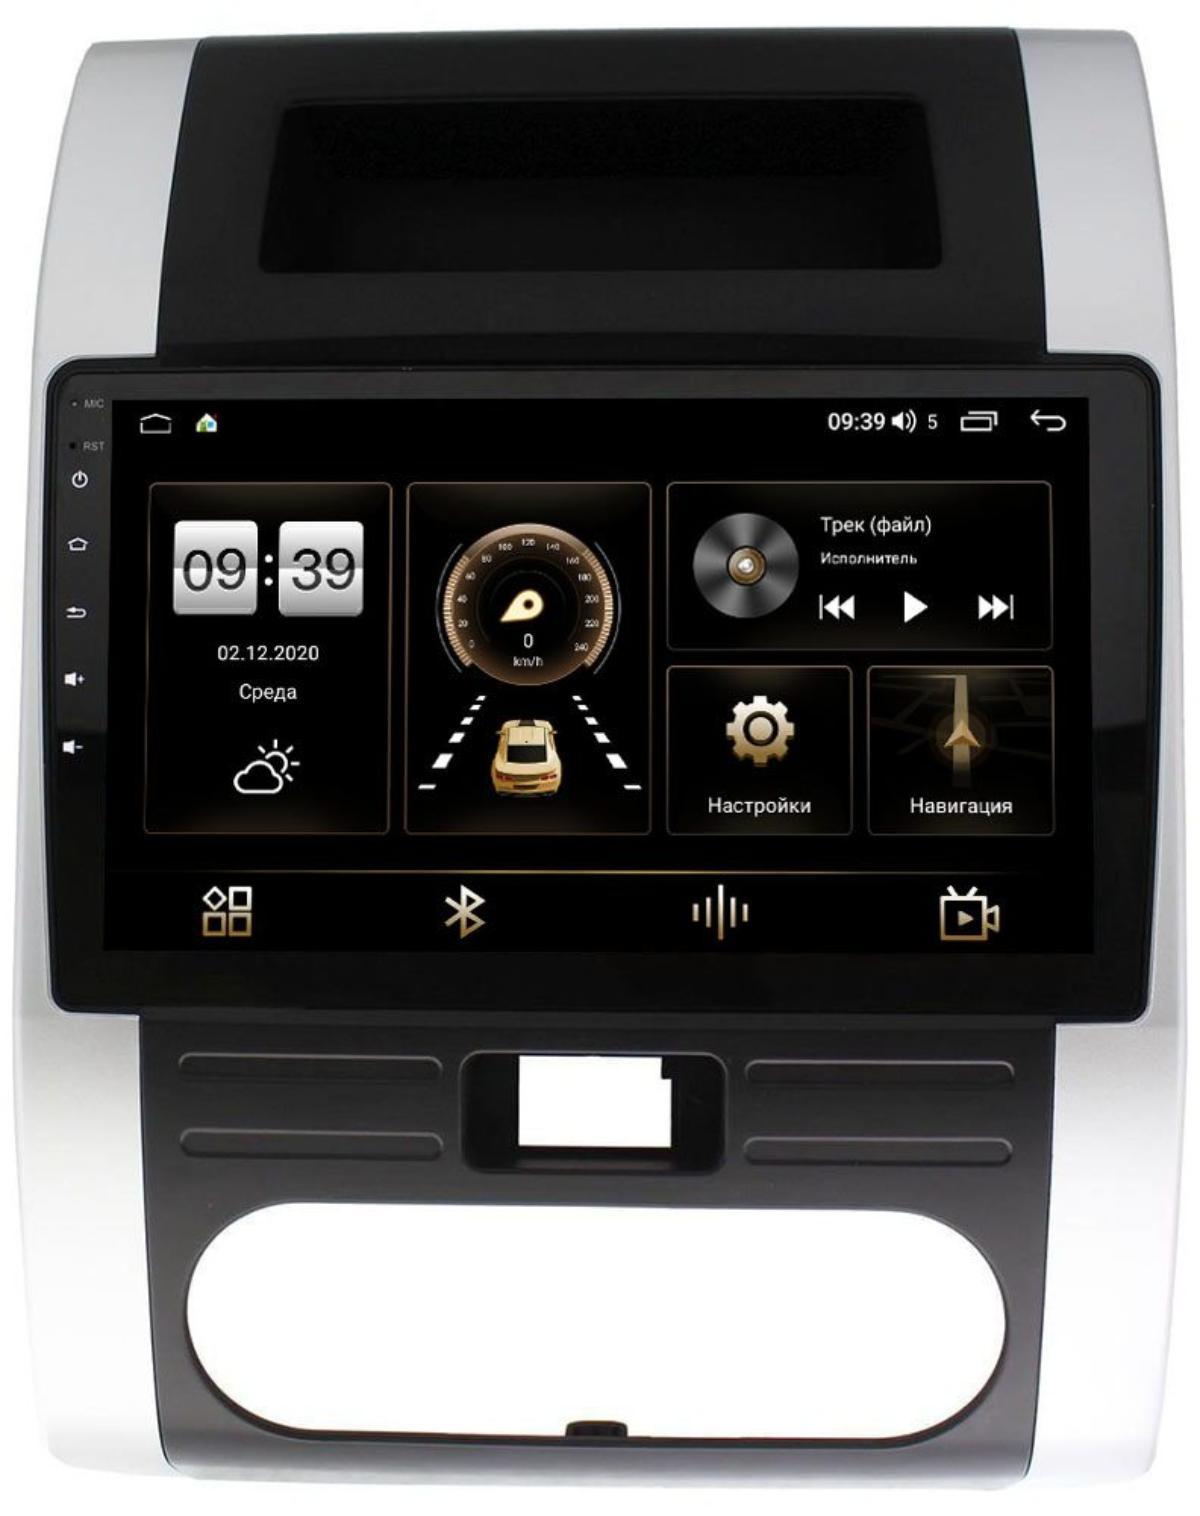 Штатная магнитола LeTrun 4165-1011 для Nissan X-Trail II (T31) 2007-2014 на Android 10 (4G-SIM, 3/32, DSP, QLed) (+ Камера заднего вида в подарок!)